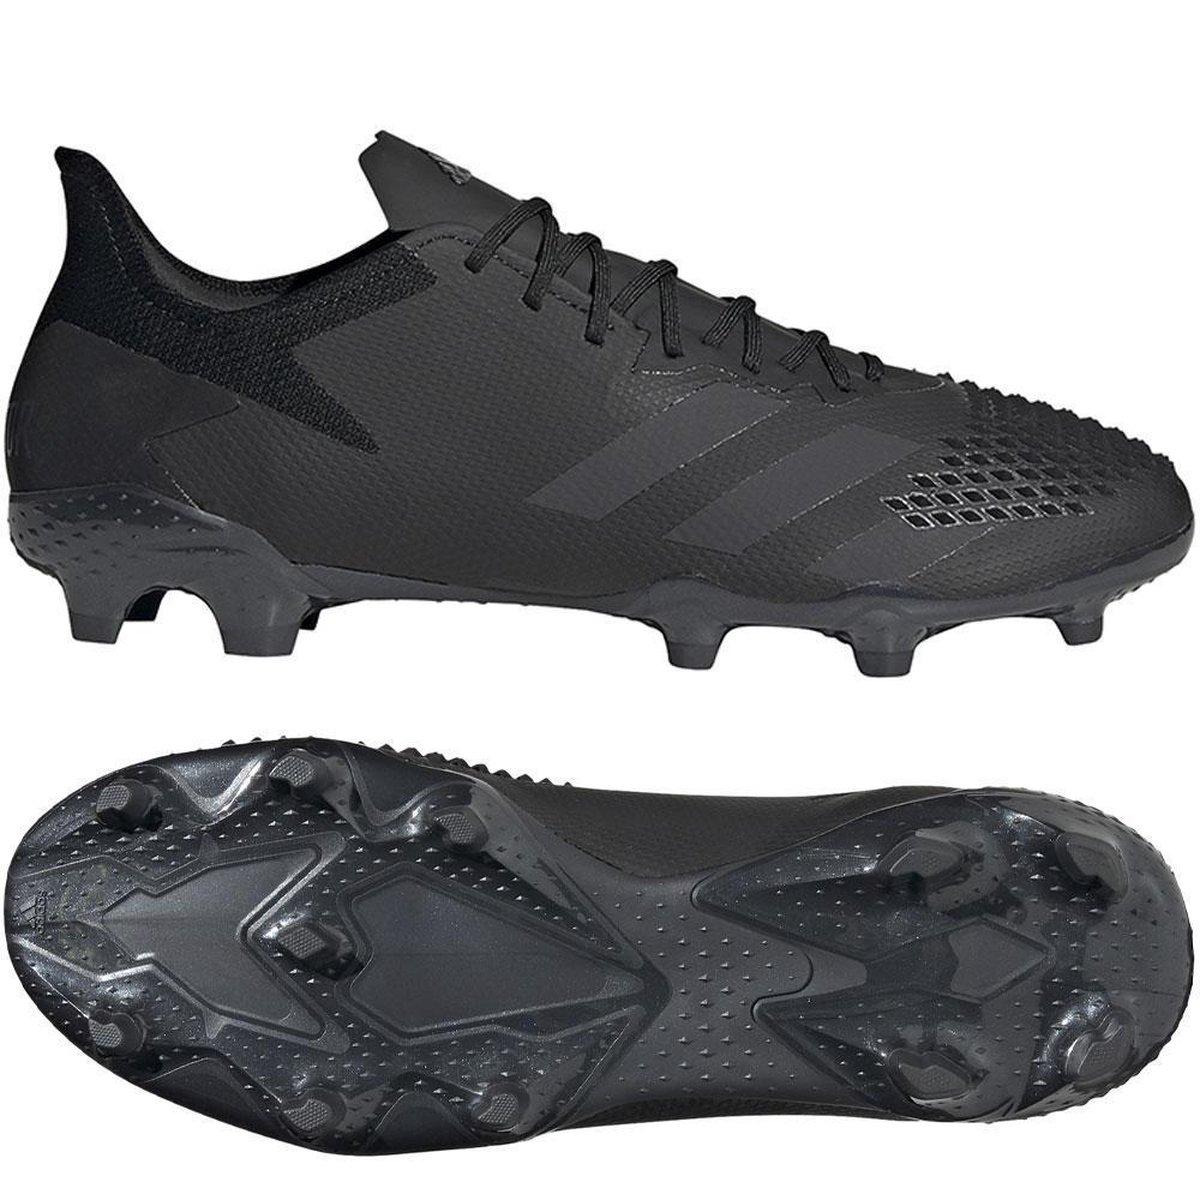 adidas Predator 20.2 FG  Sportschoenen - Maat 42 2/3 - Mannen - zwart Sportschoenen